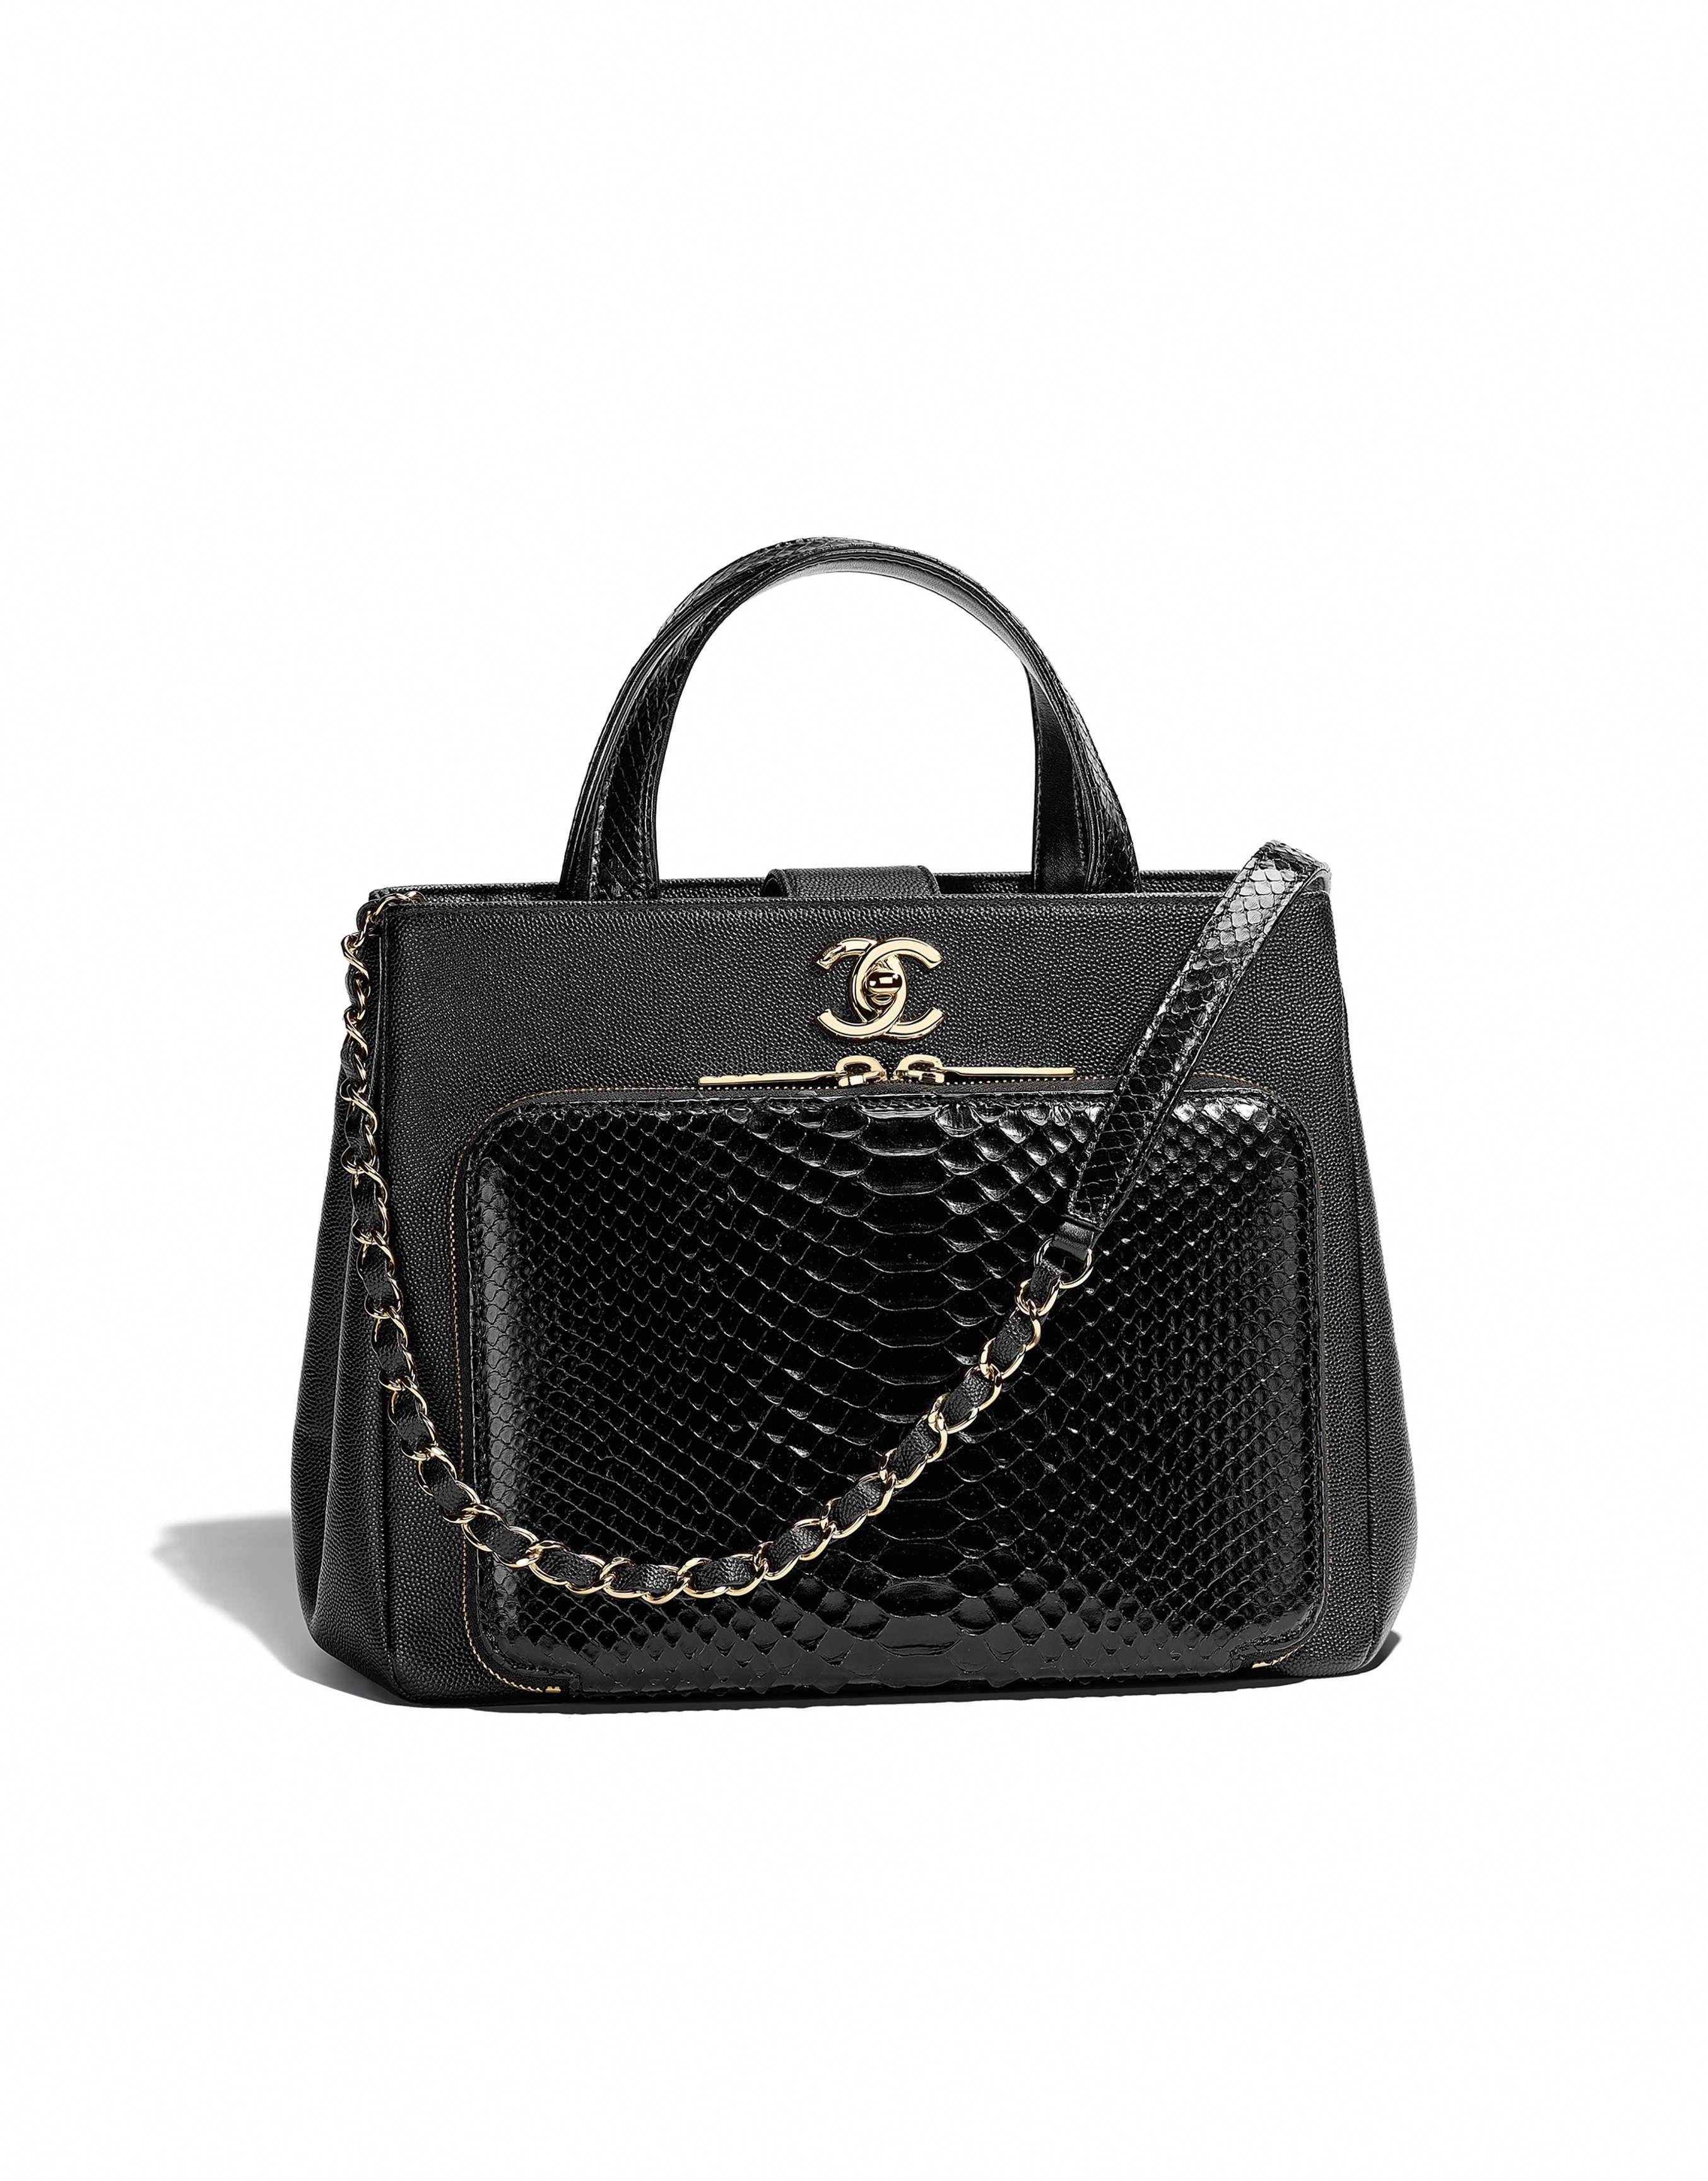 81211cbaaf2 SPRING-SUMMER 2018 - crumpled calfskin, pvc, resin   silver-tone  metal-turquoise  Chanelhandbags   Chanel handbags in 2018   Pinterest    Chanel handbags, ...